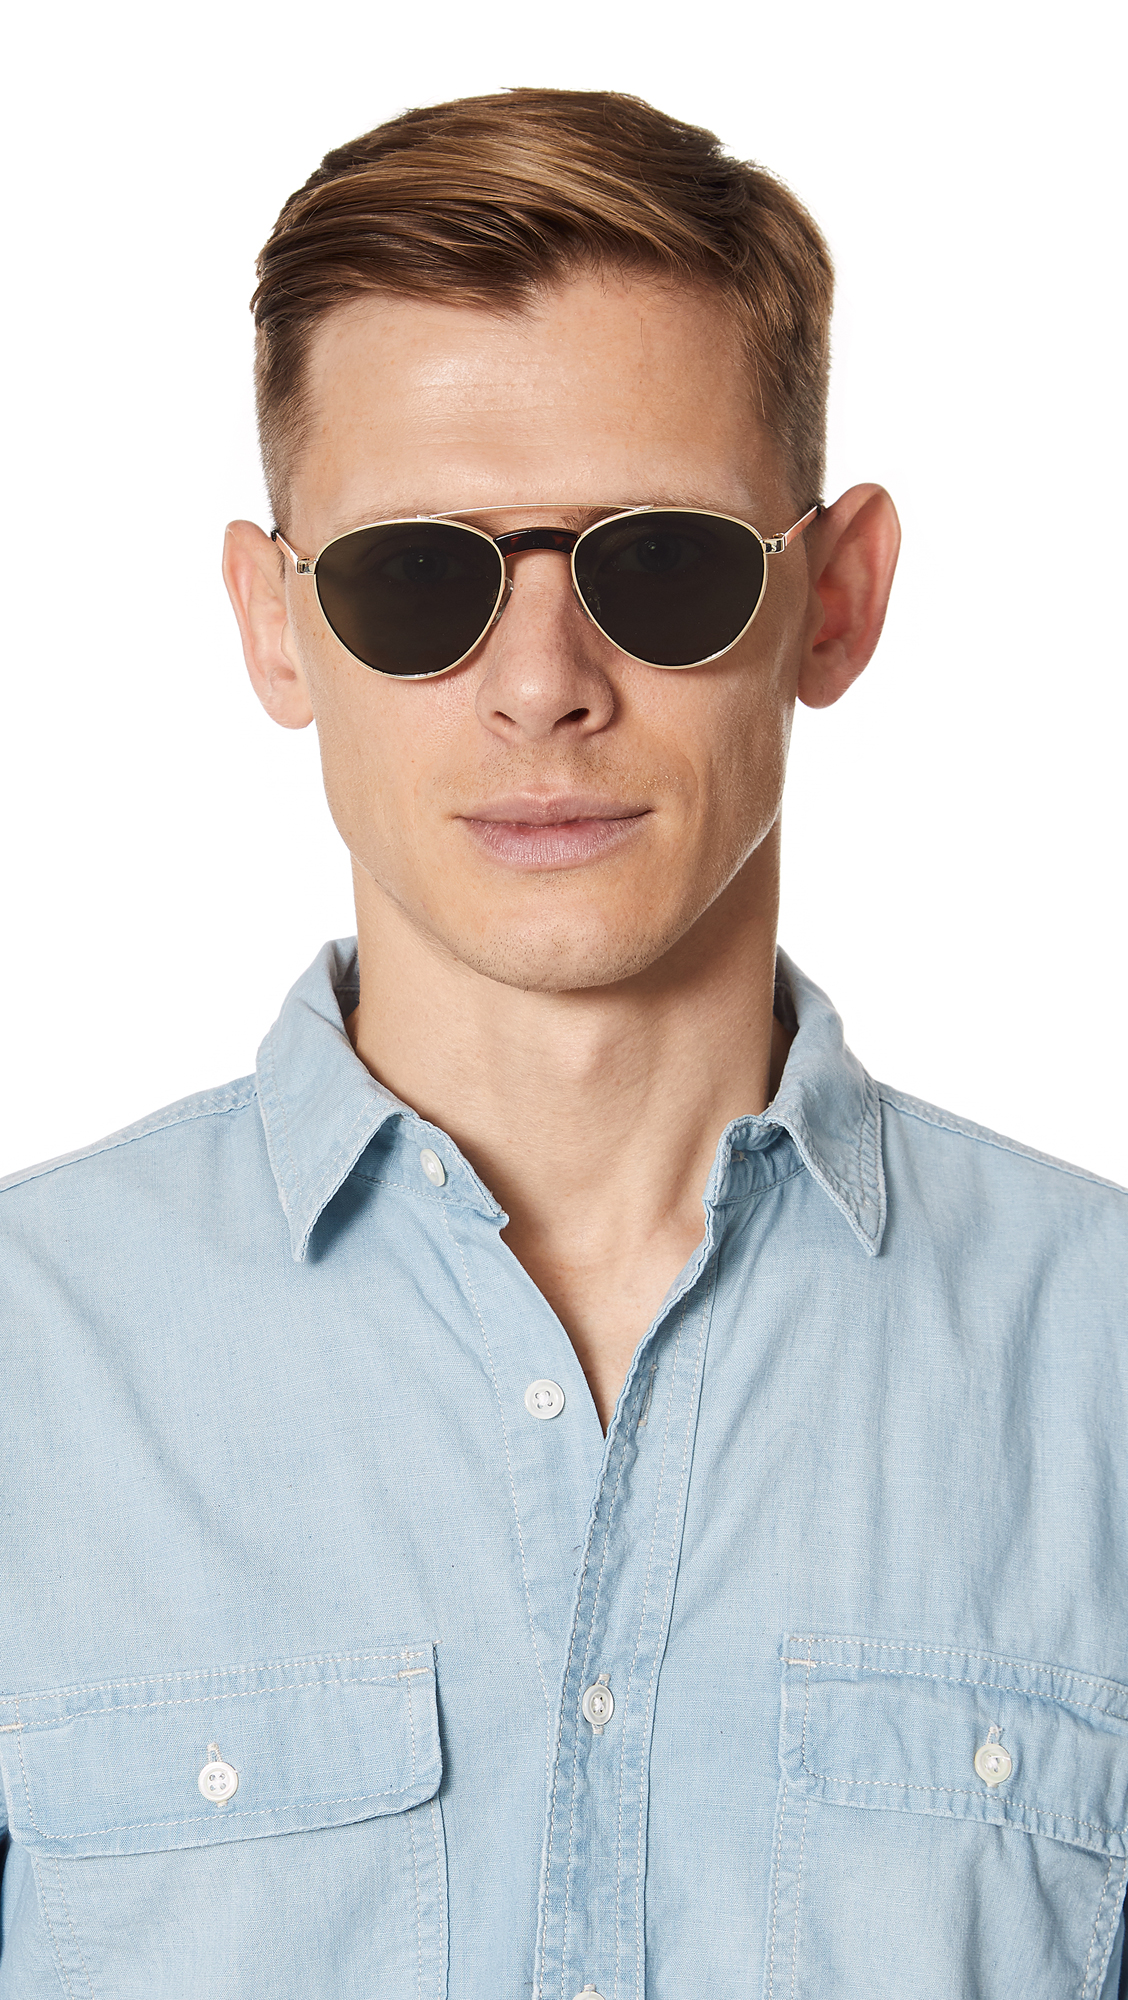 fc5ffe8261 Le Specs Rocket Man Edition Sunglasses